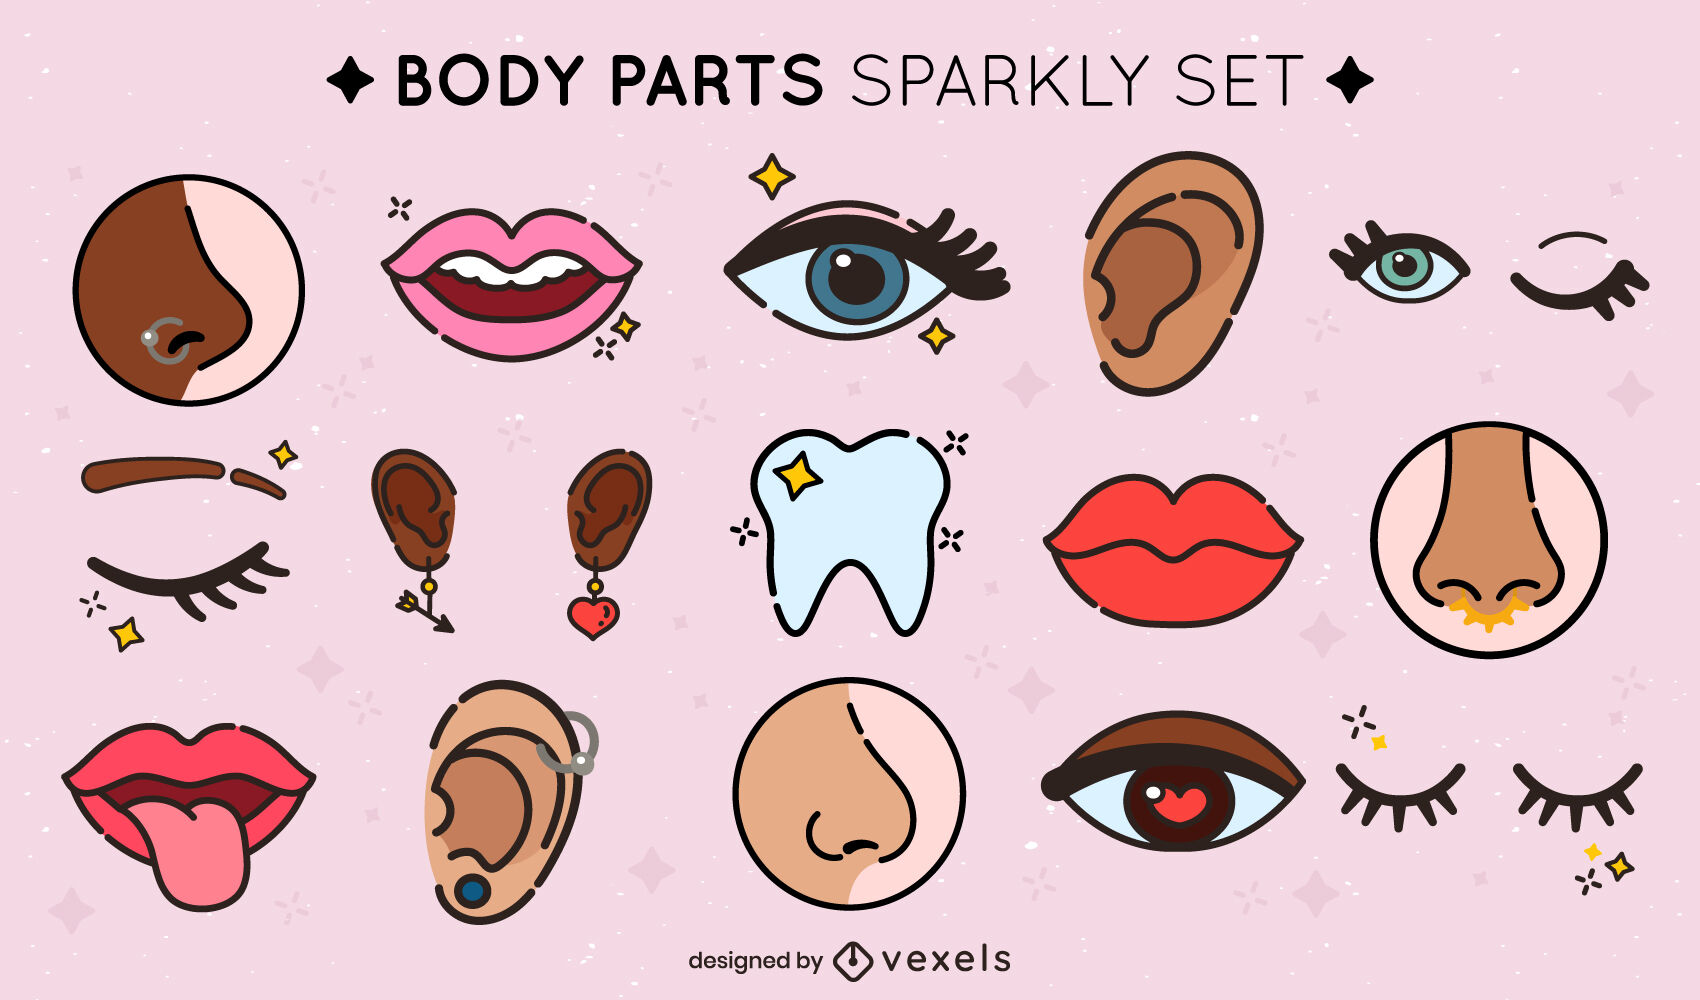 Sparkly face parts color stroke set